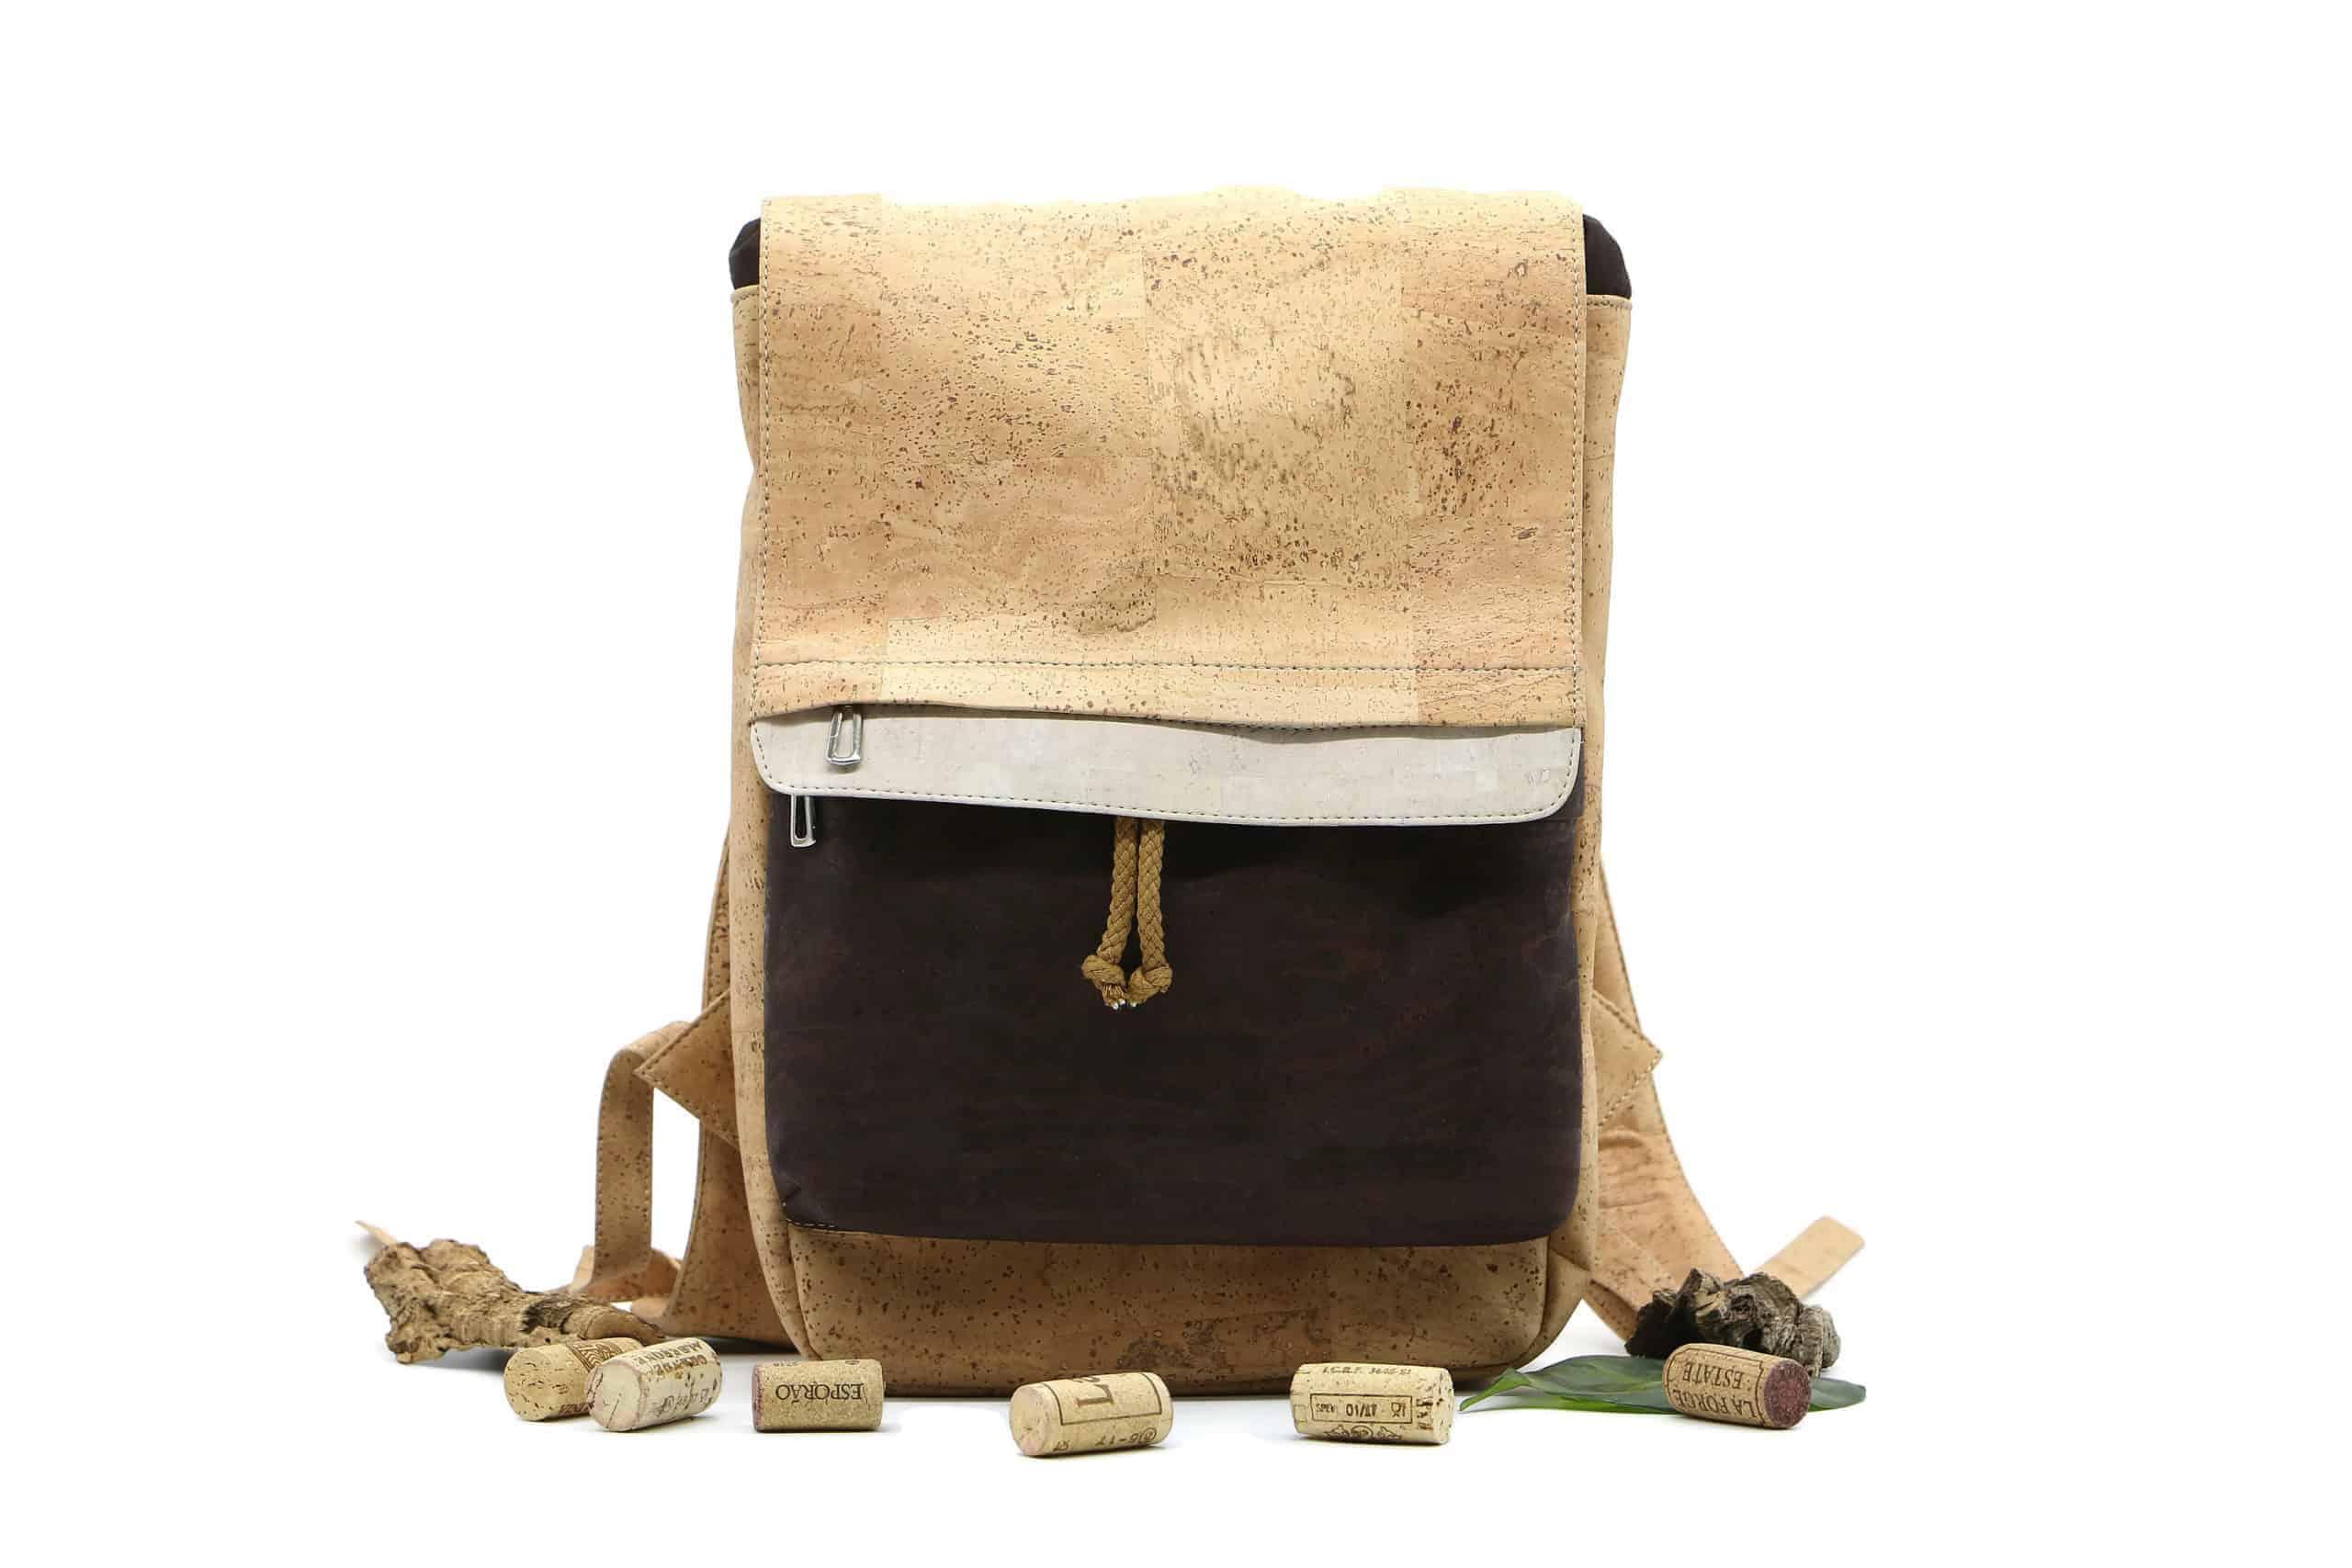 Kork Rucksack - School Bag Style